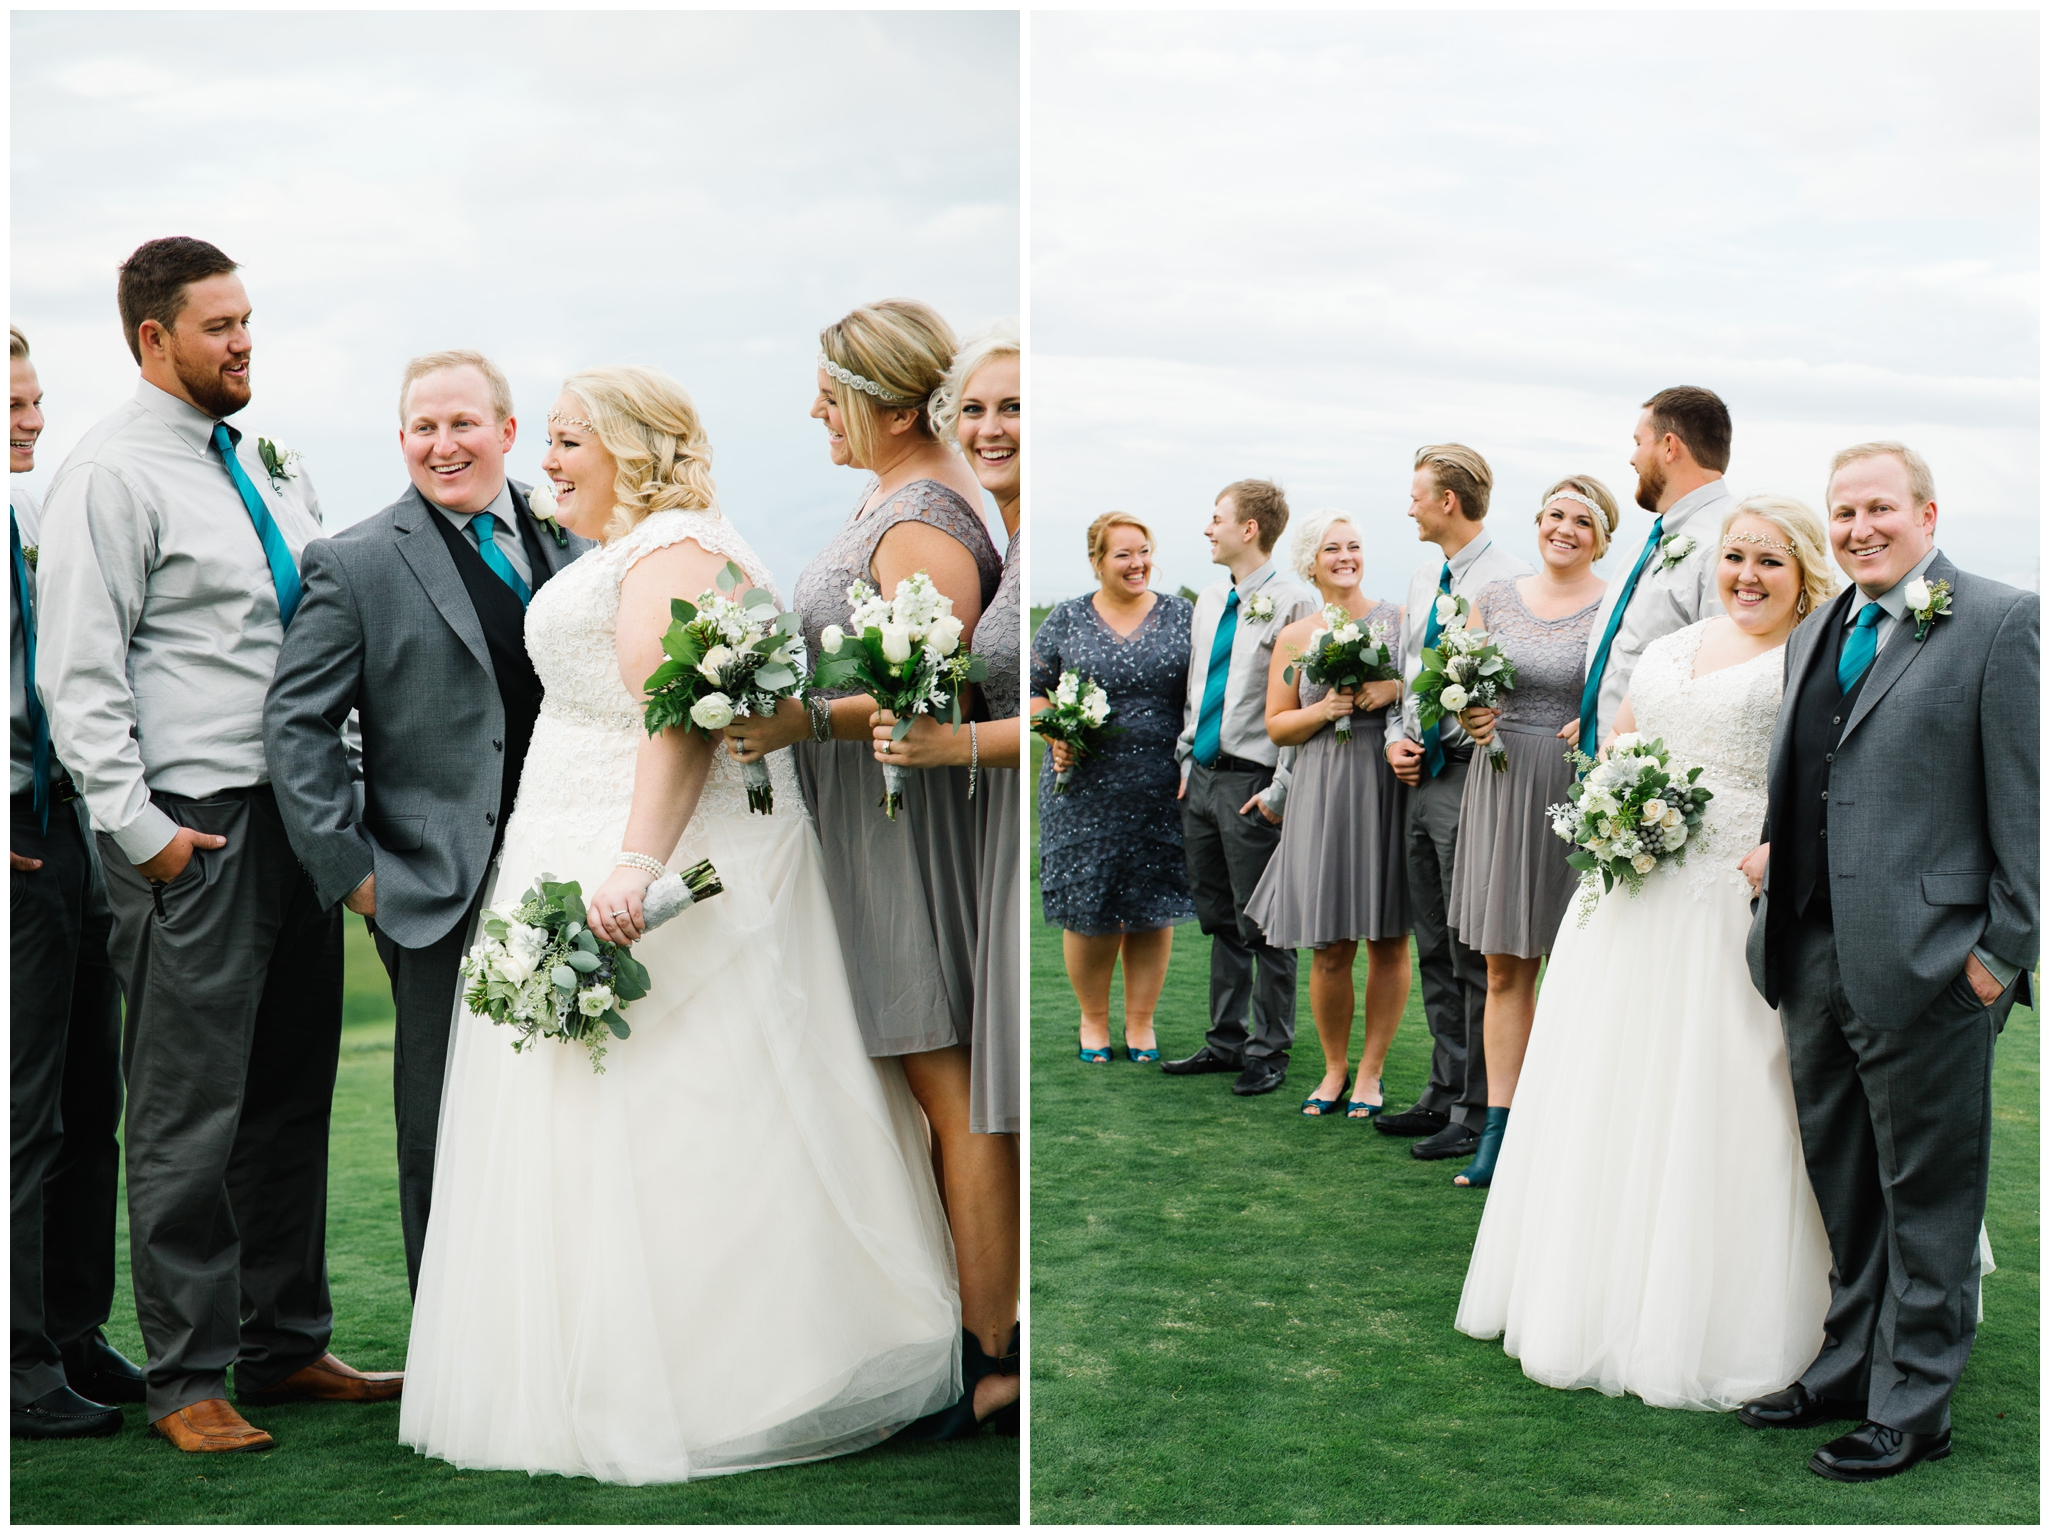 ChrisLeslie_Wedding_106.jpg